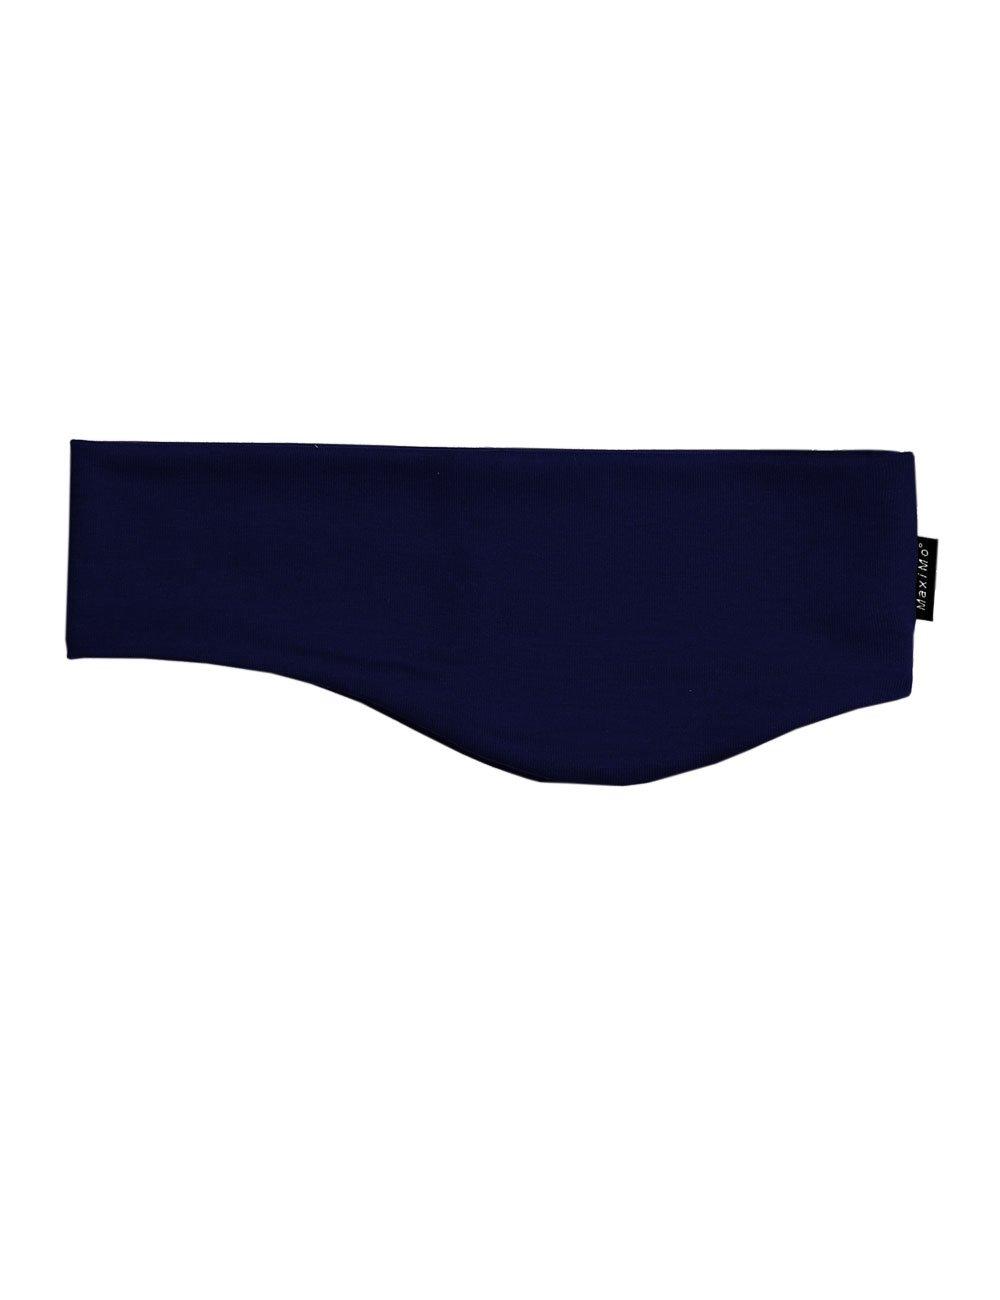 maximo Boy's Headband maximo Boys' Stirnband ausgenäht Blue (Dunkelmarine 11) 53